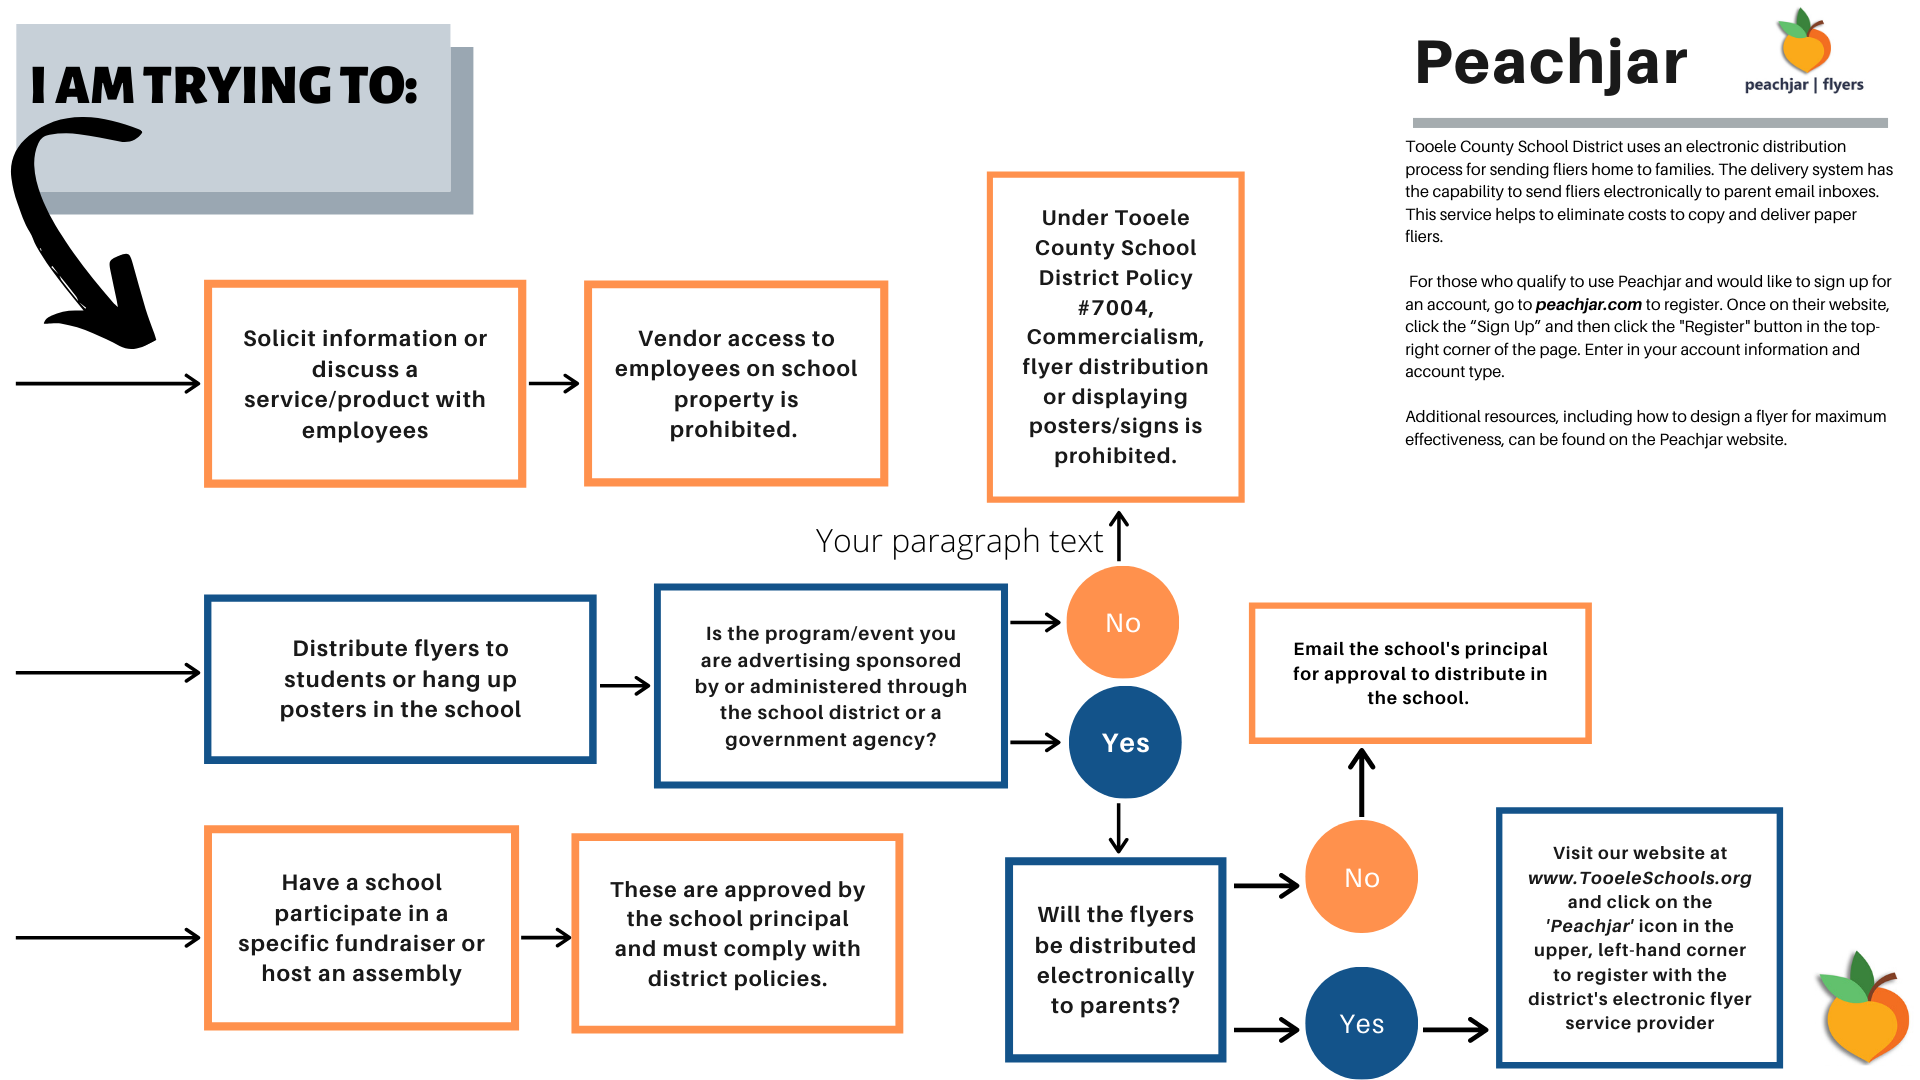 PeachJar Flow Chart